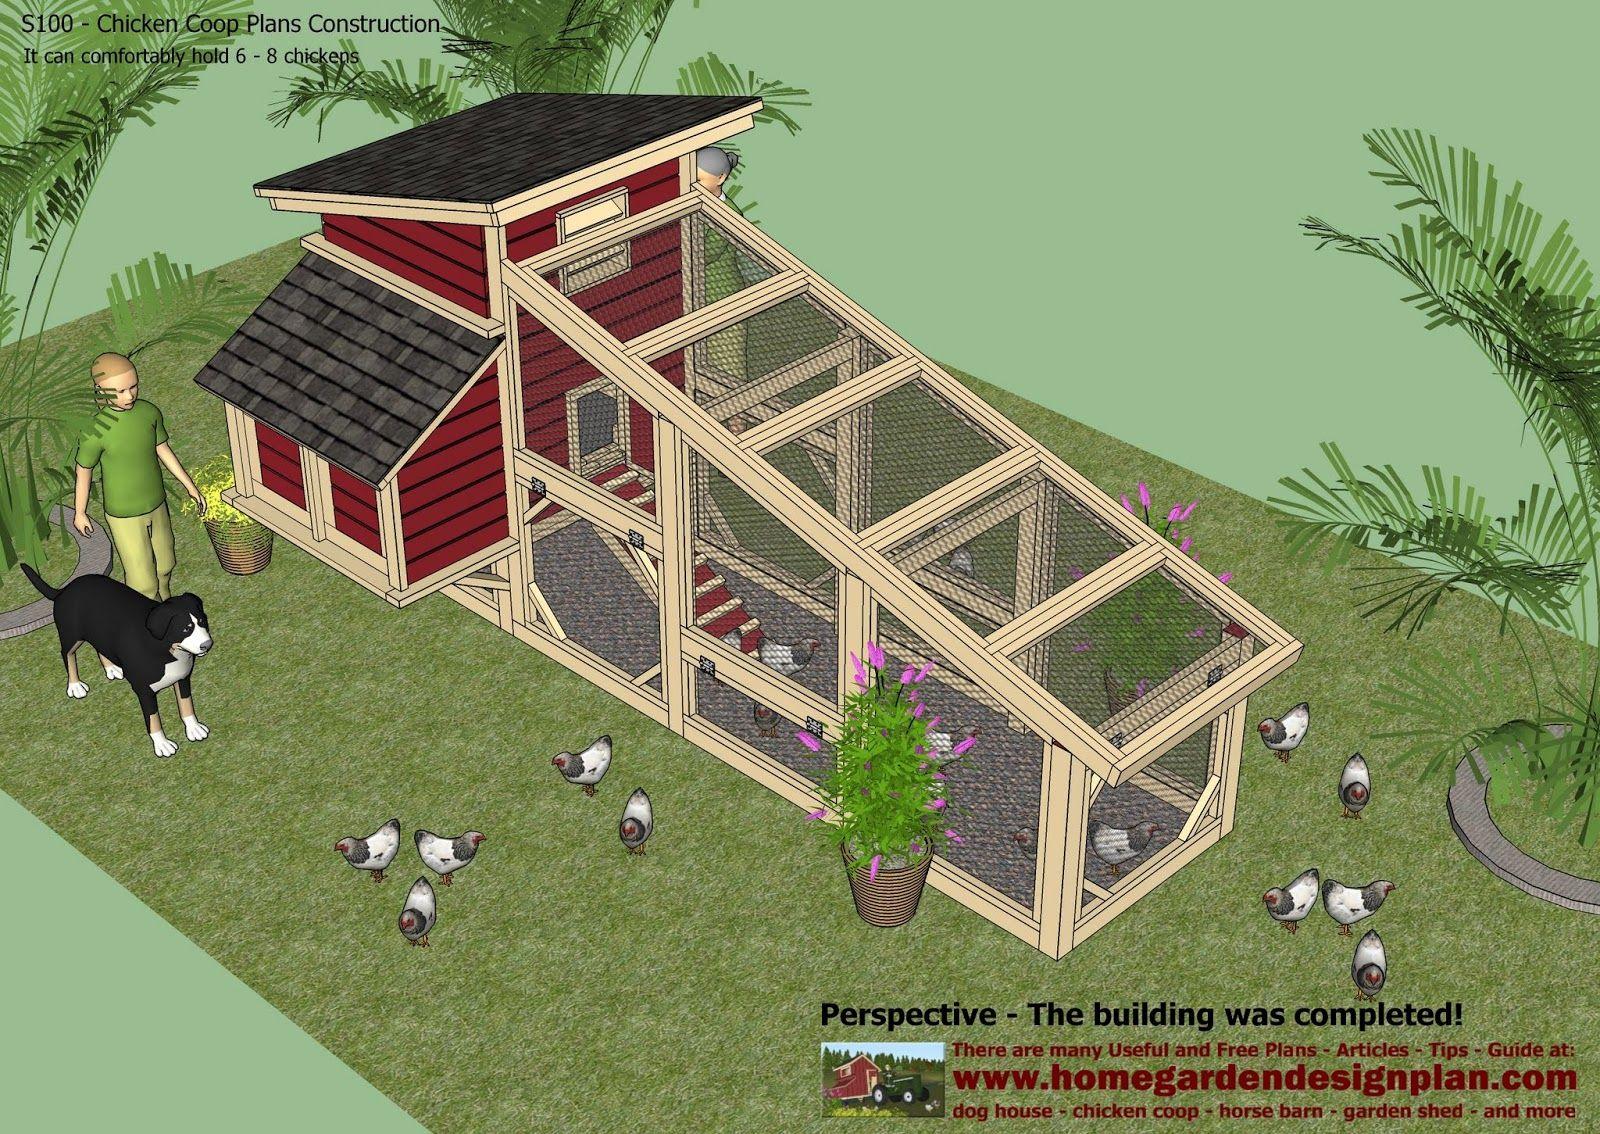 S100 - Chicken Coop Plans Construction